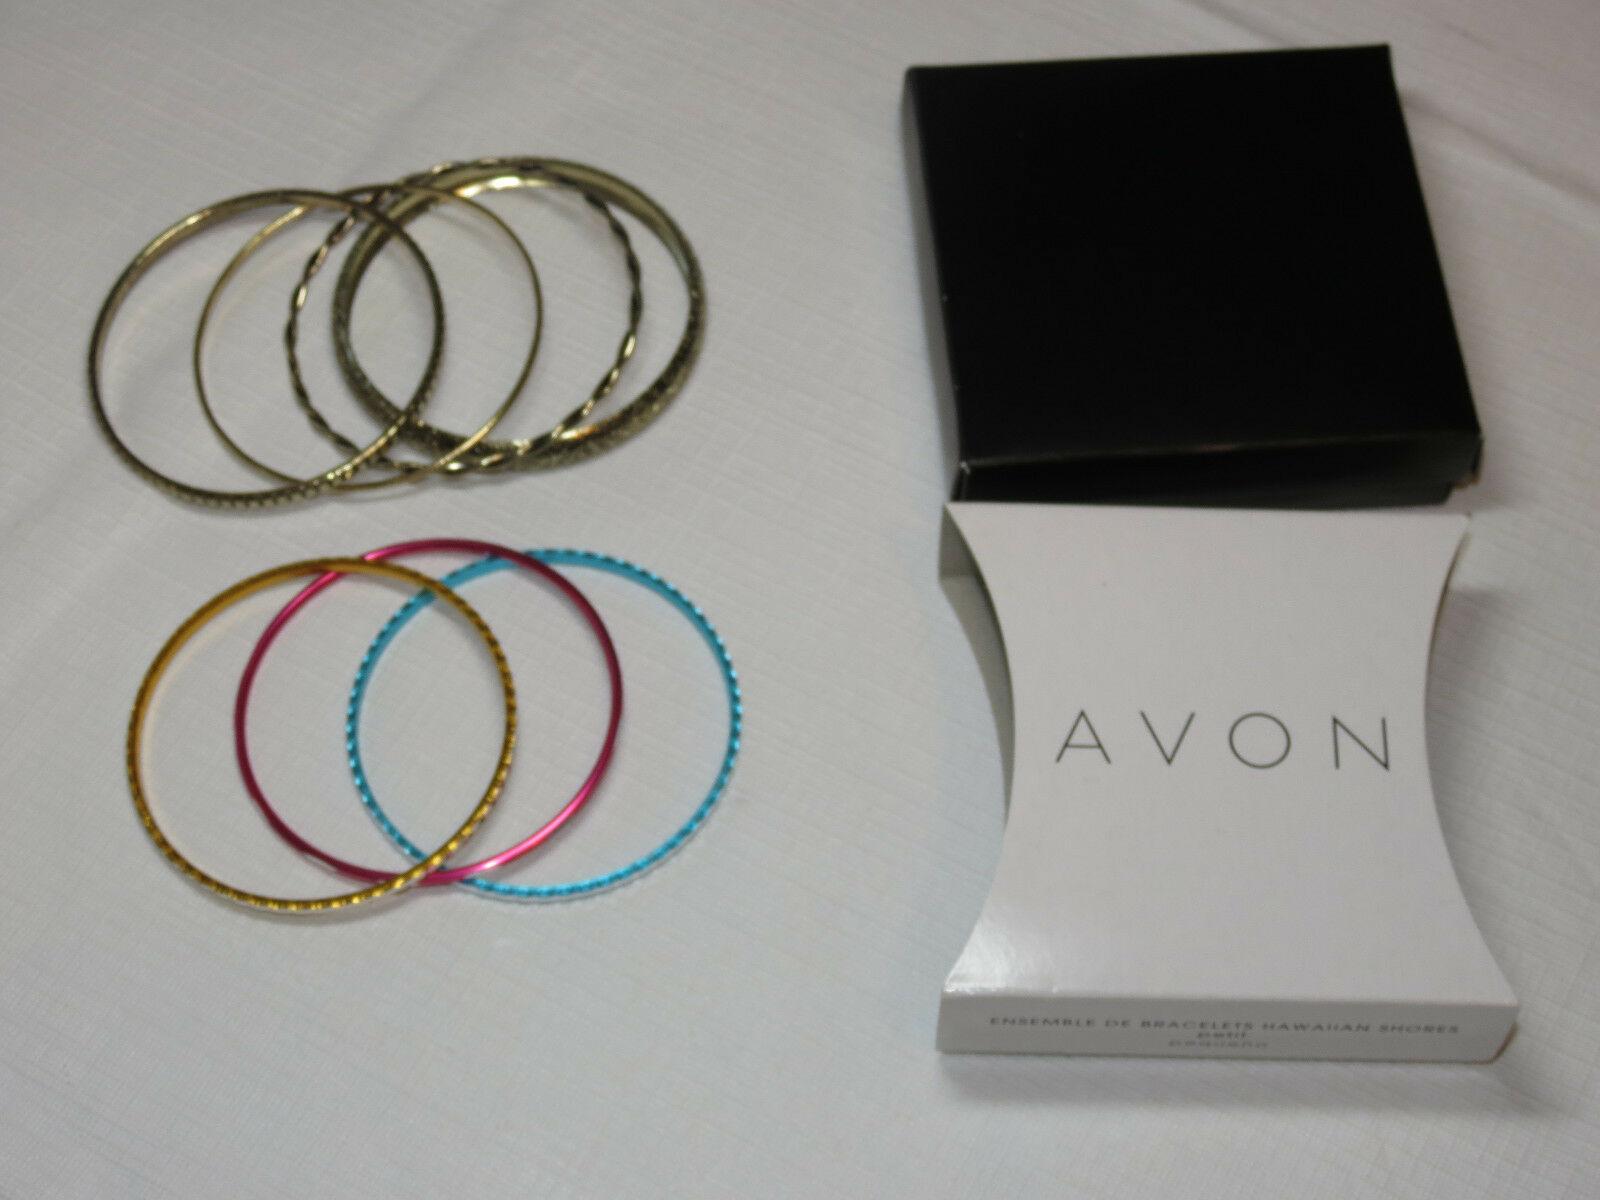 Femmes Avon Hawaïen Shores Bracelet Petit 7 Bracelets Multi F3610691 Nip